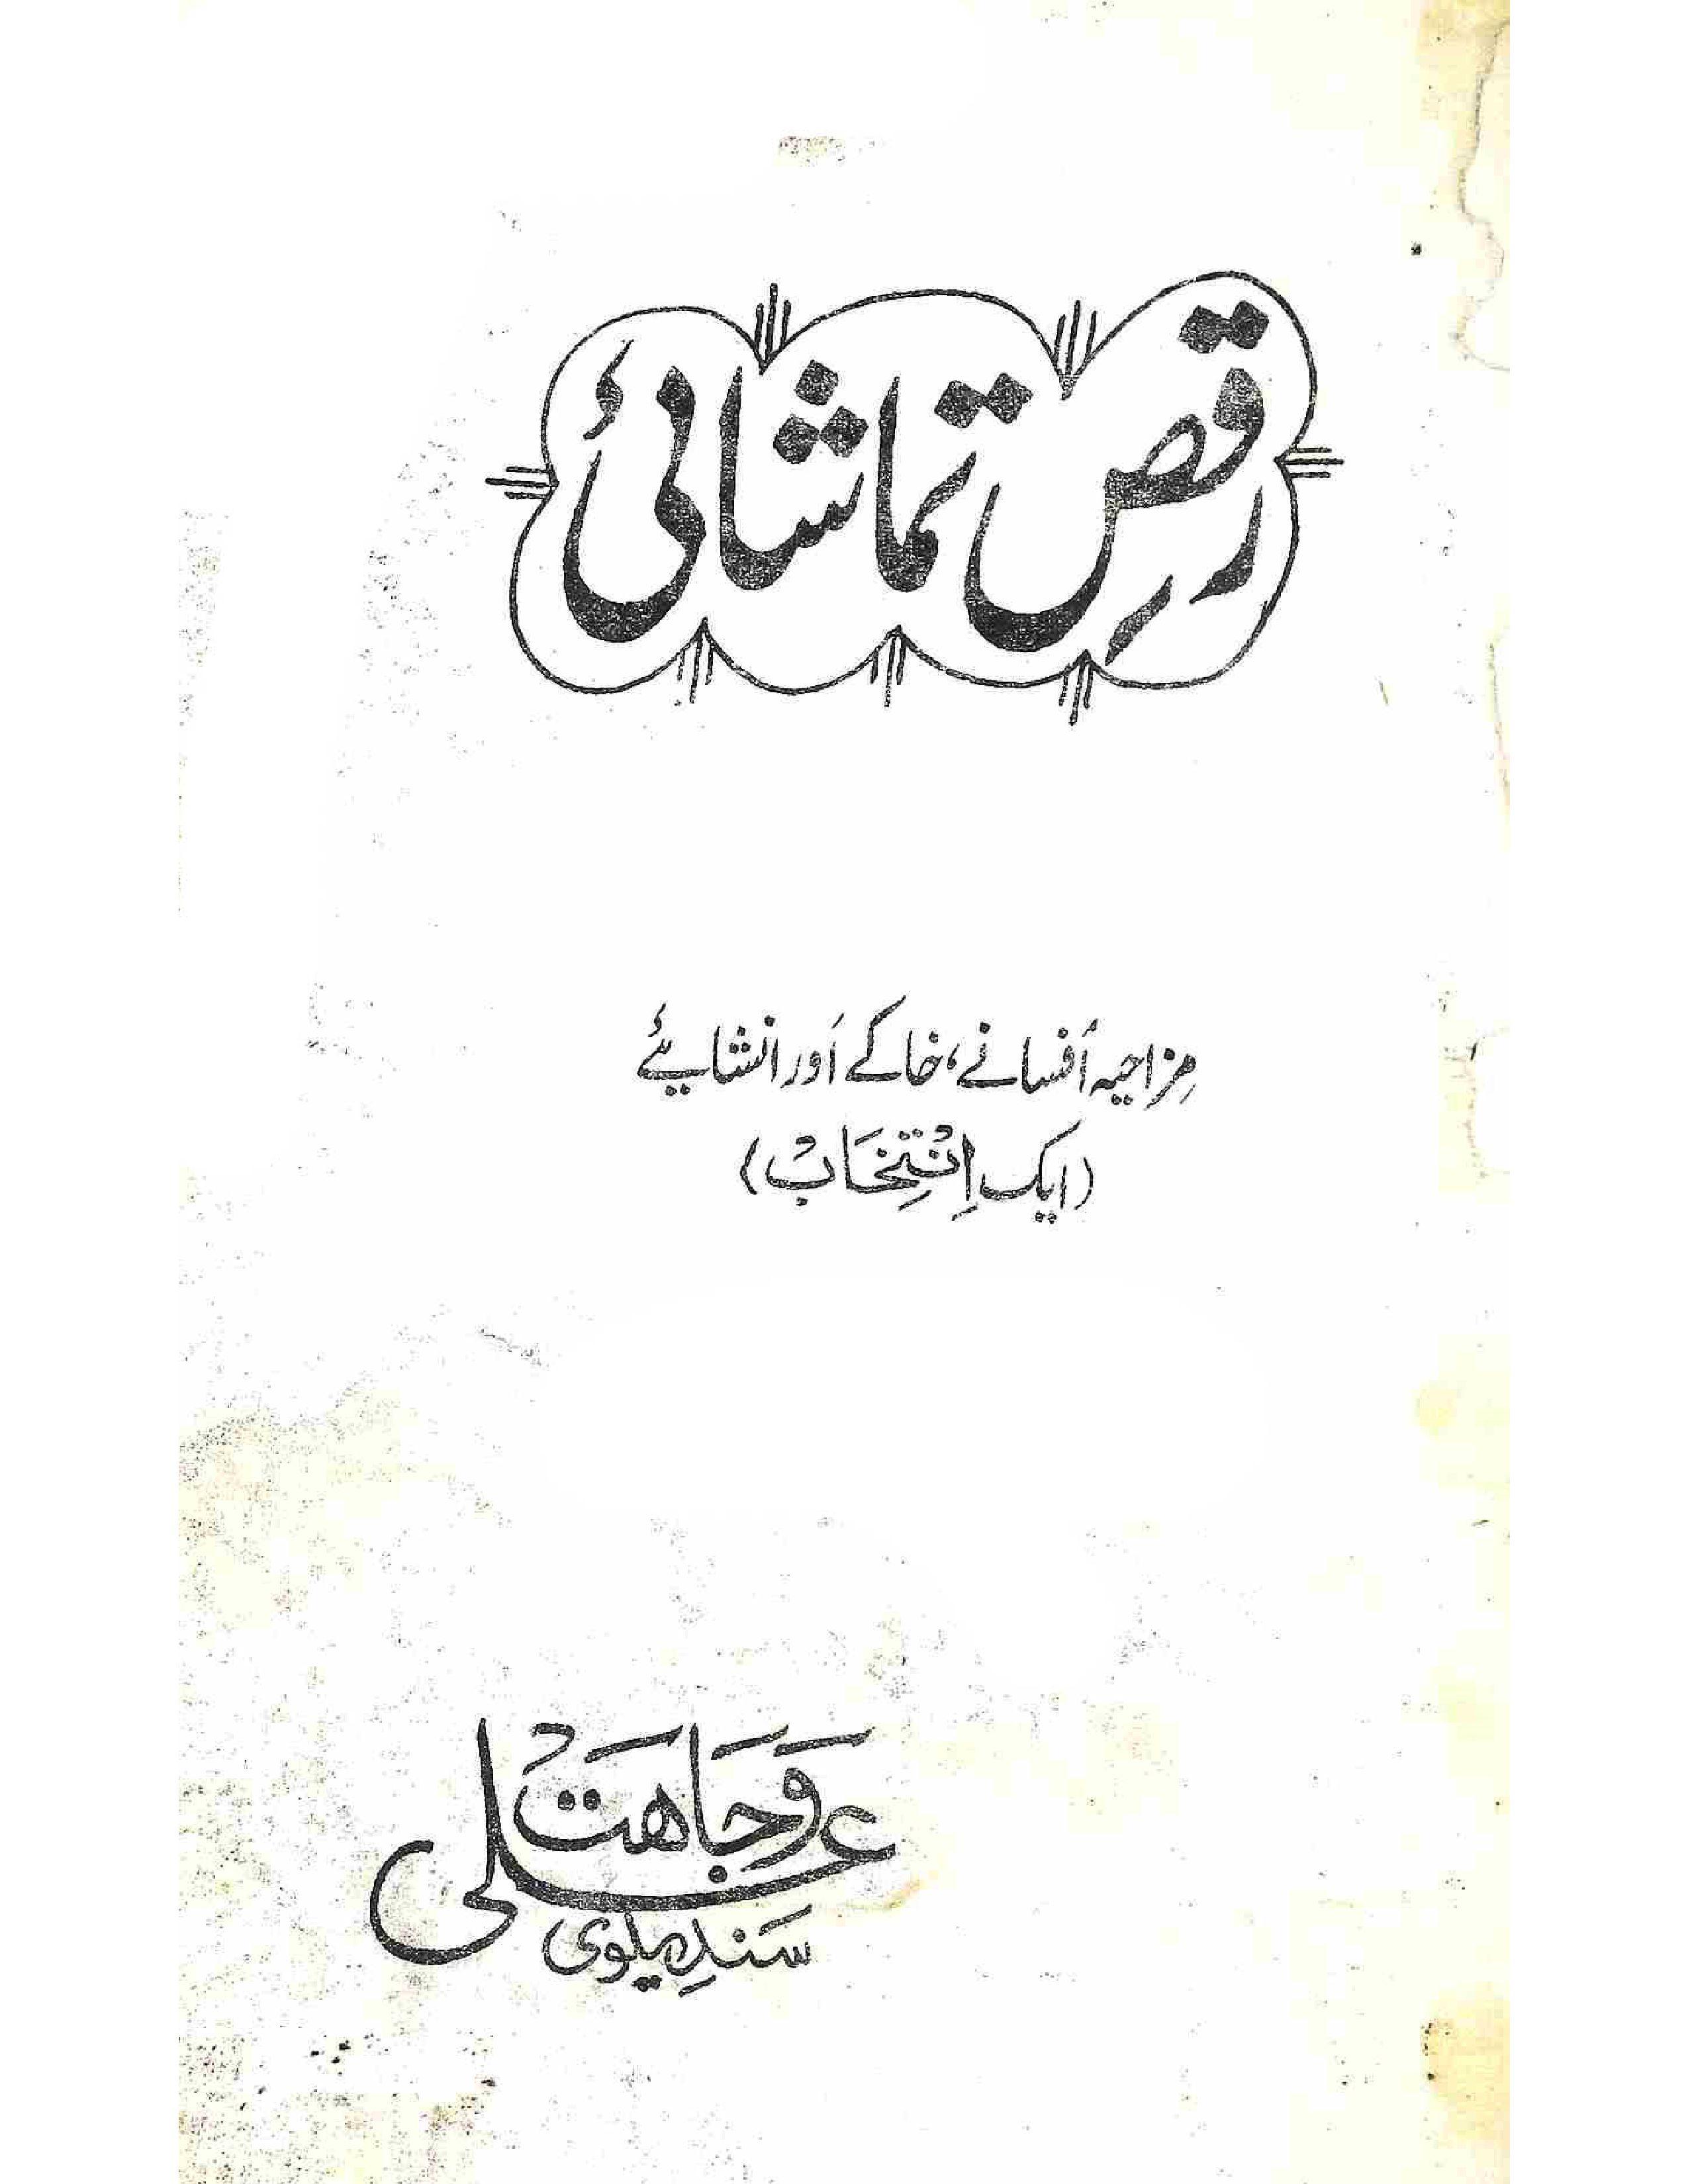 Raqs-e-Tamashai